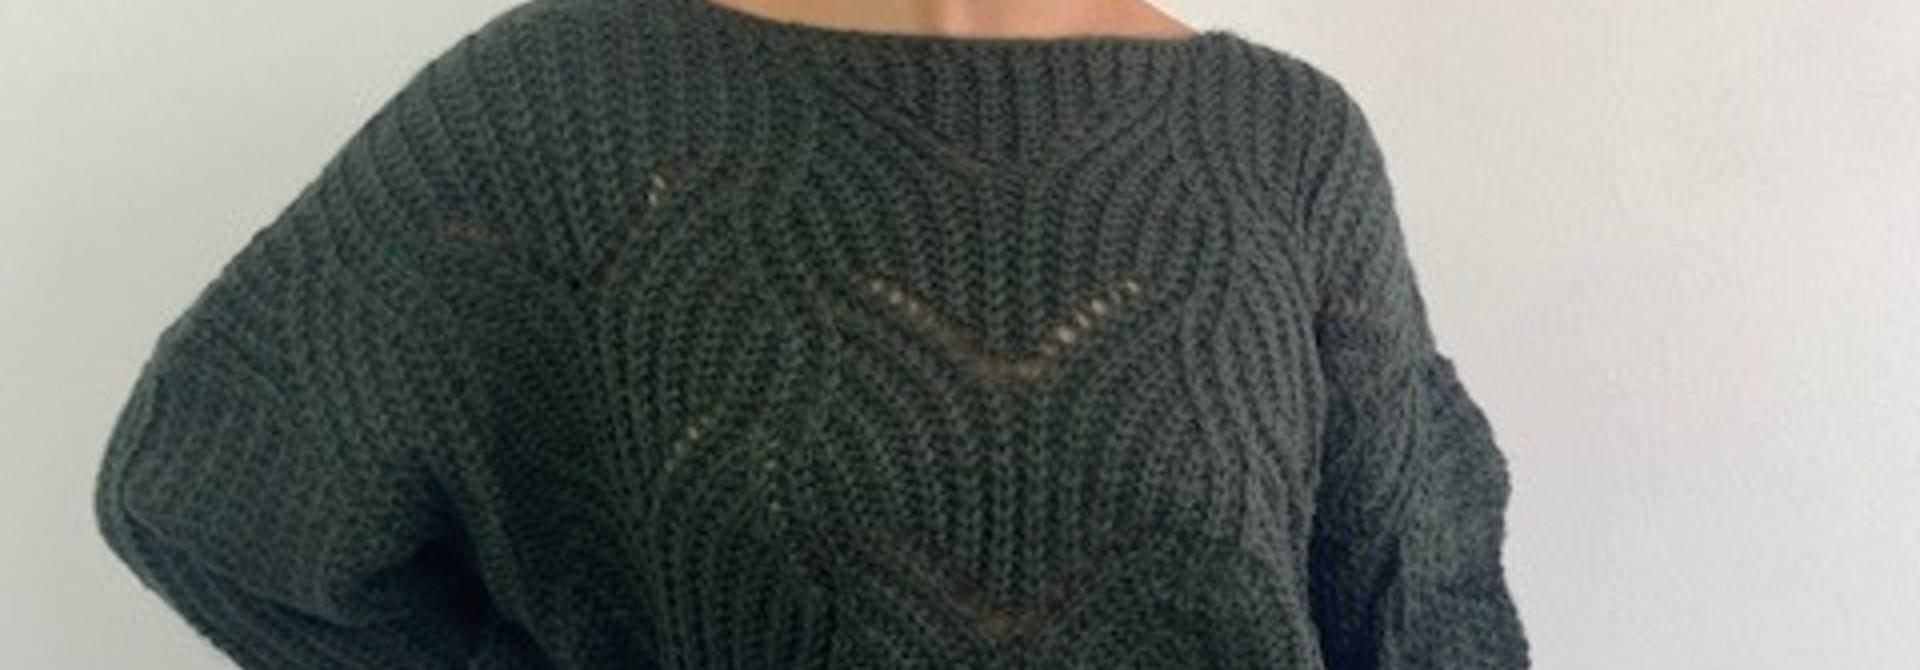 Emea ajour knit Dark Green